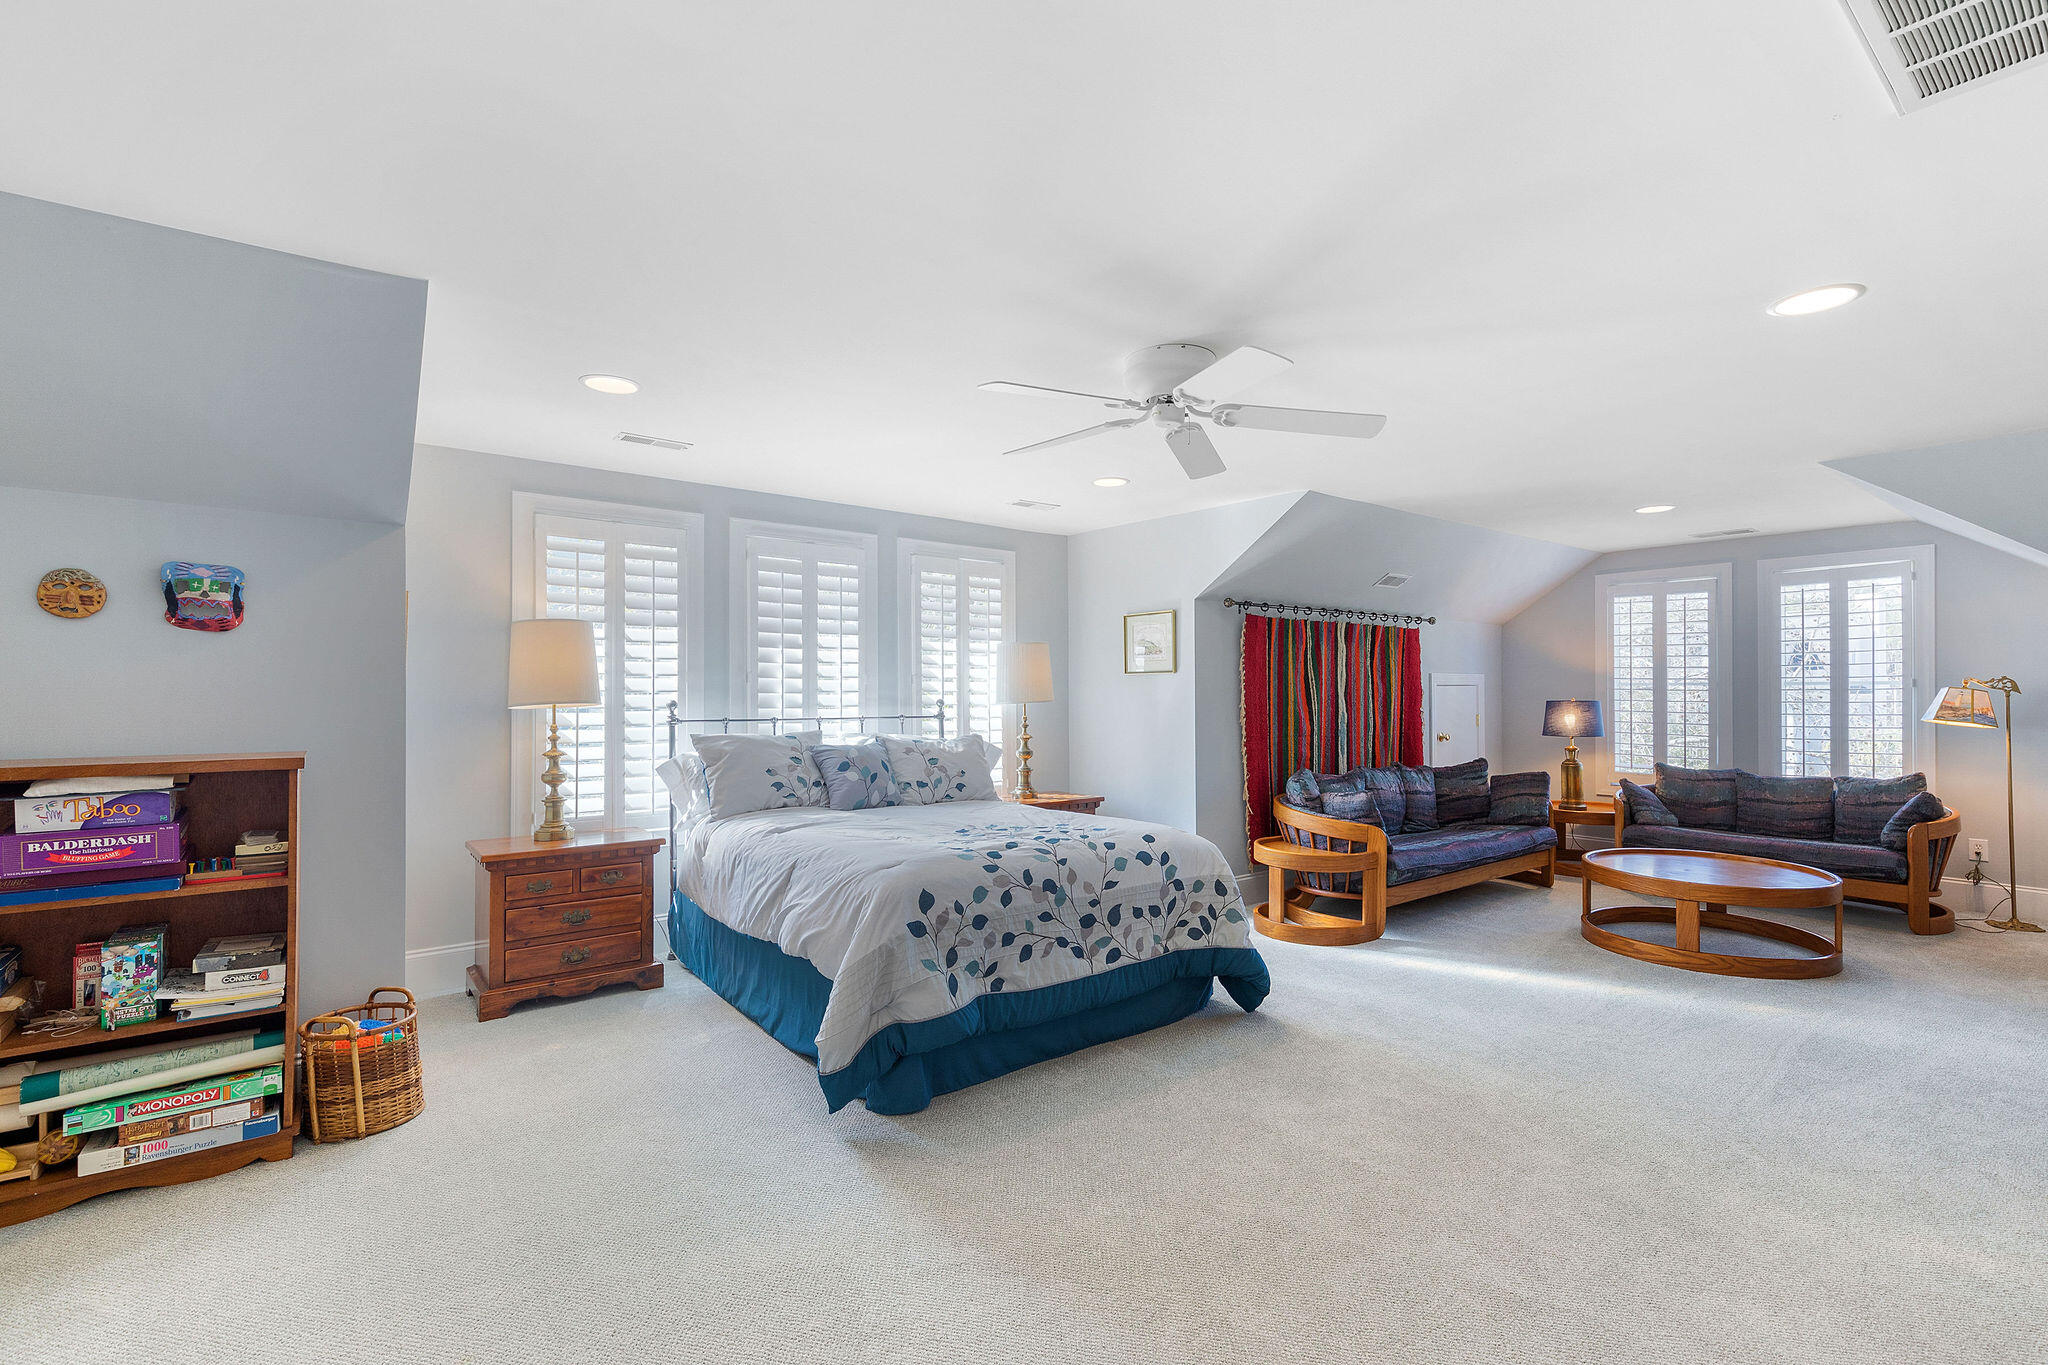 Back Bay Village Homes For Sale - 244 Indigo Bay Circle, Mount Pleasant, SC - 81